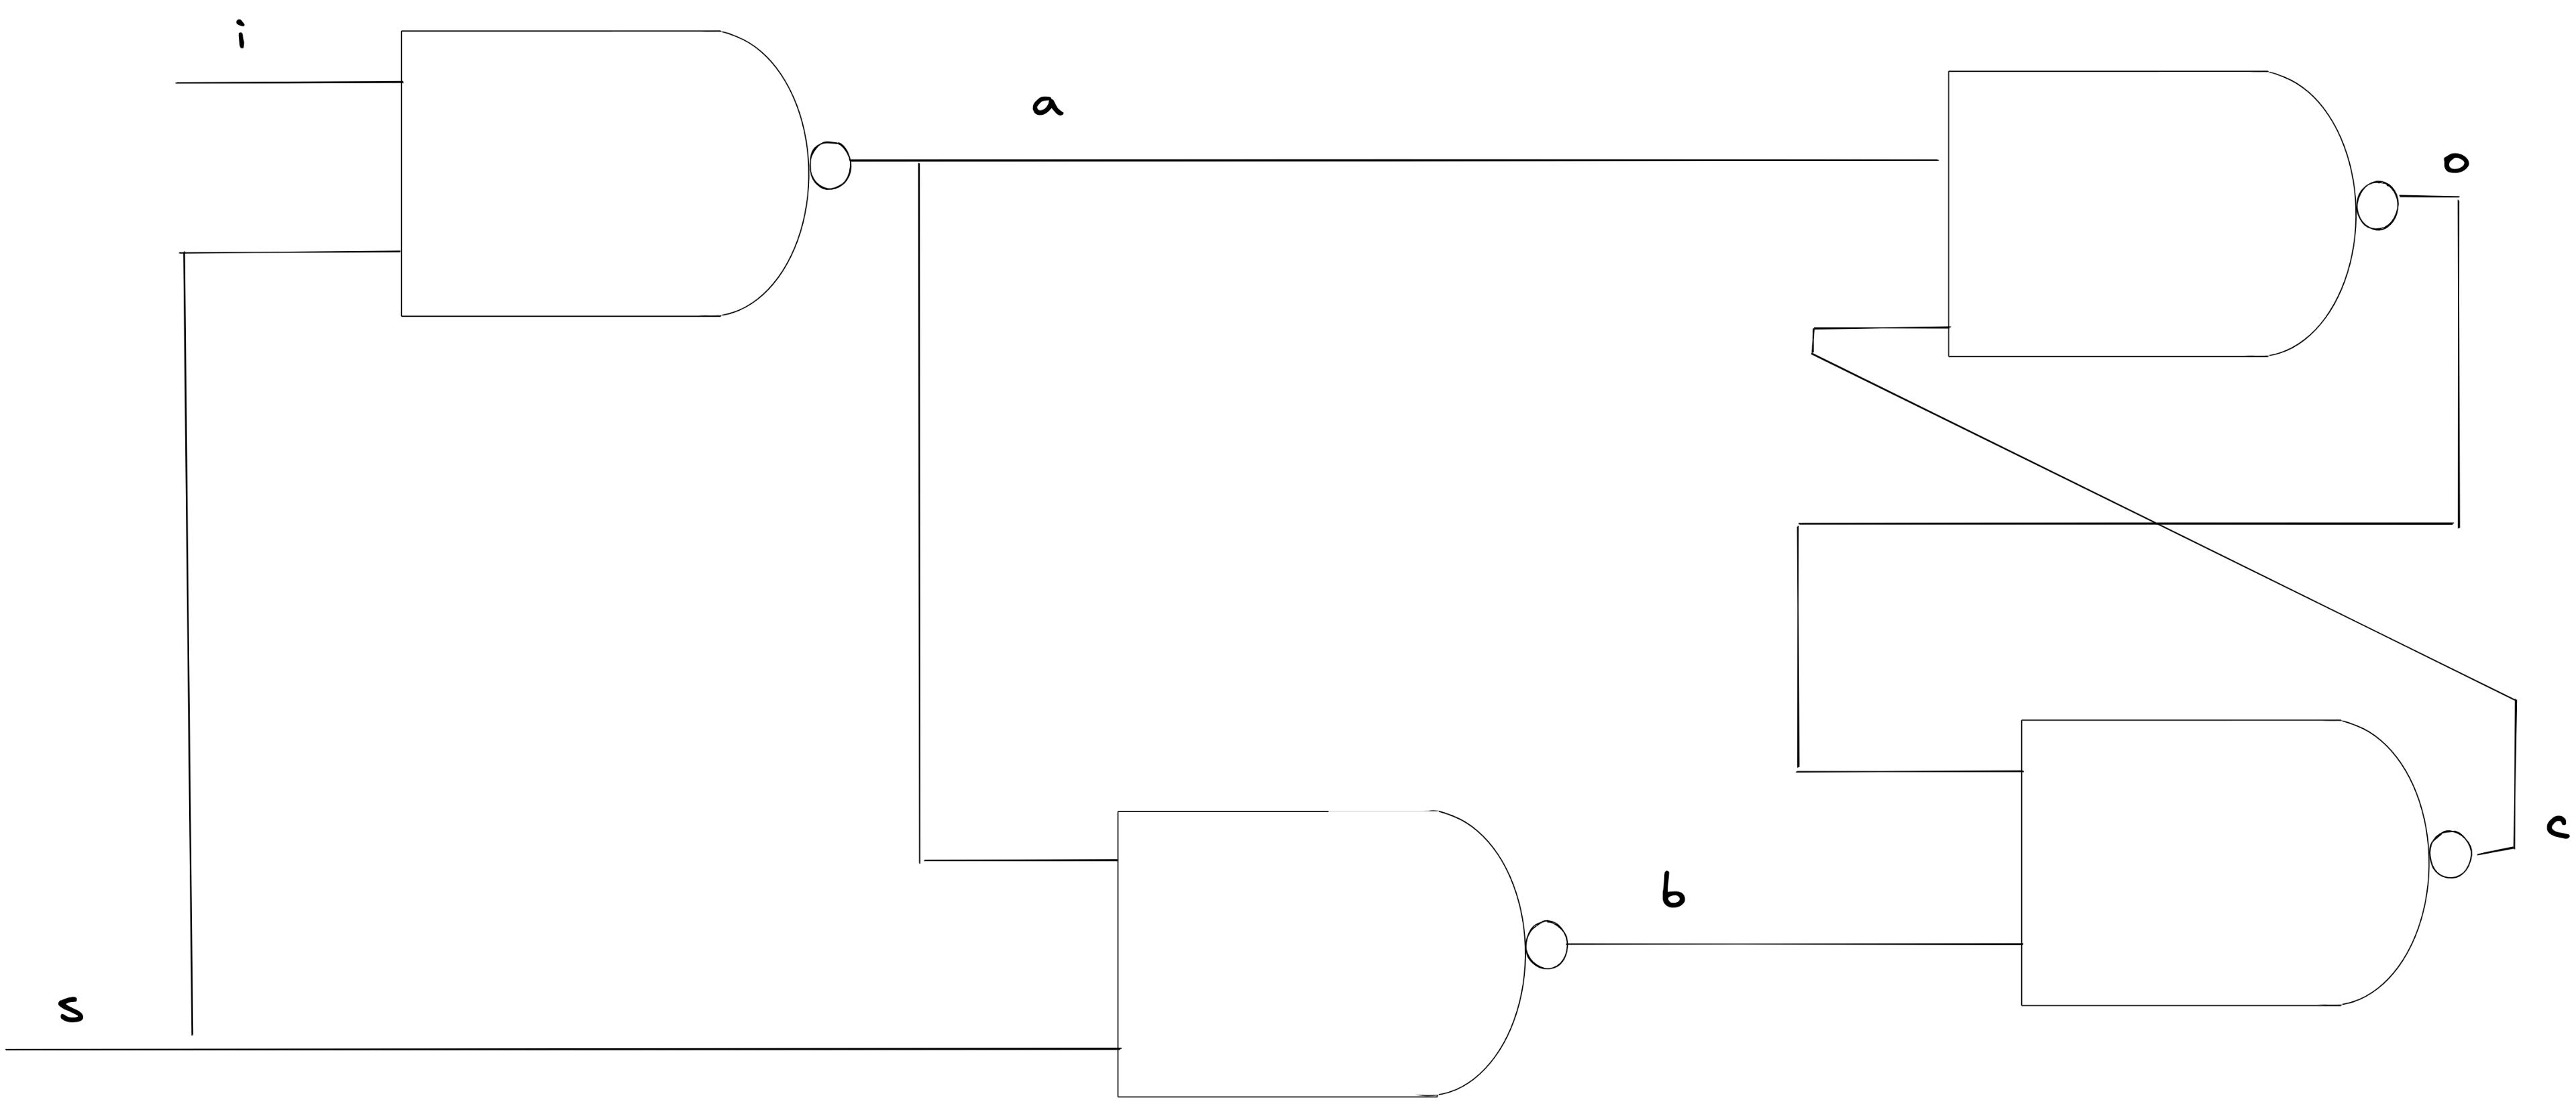 umair-akbar-aHR0cHM6Ly91c2VyLWltYWdlcy5naXRodWJ1c2VyY29udGVudC5jb20vOTg0NTc0Lzk1Nzc2NjkyLWQxM2IxMjAwLTBjOTItMTFlYi05MzQxLTk0MmMyMzFhZGJjYy5wbmc - Simulating RAM in Clojure